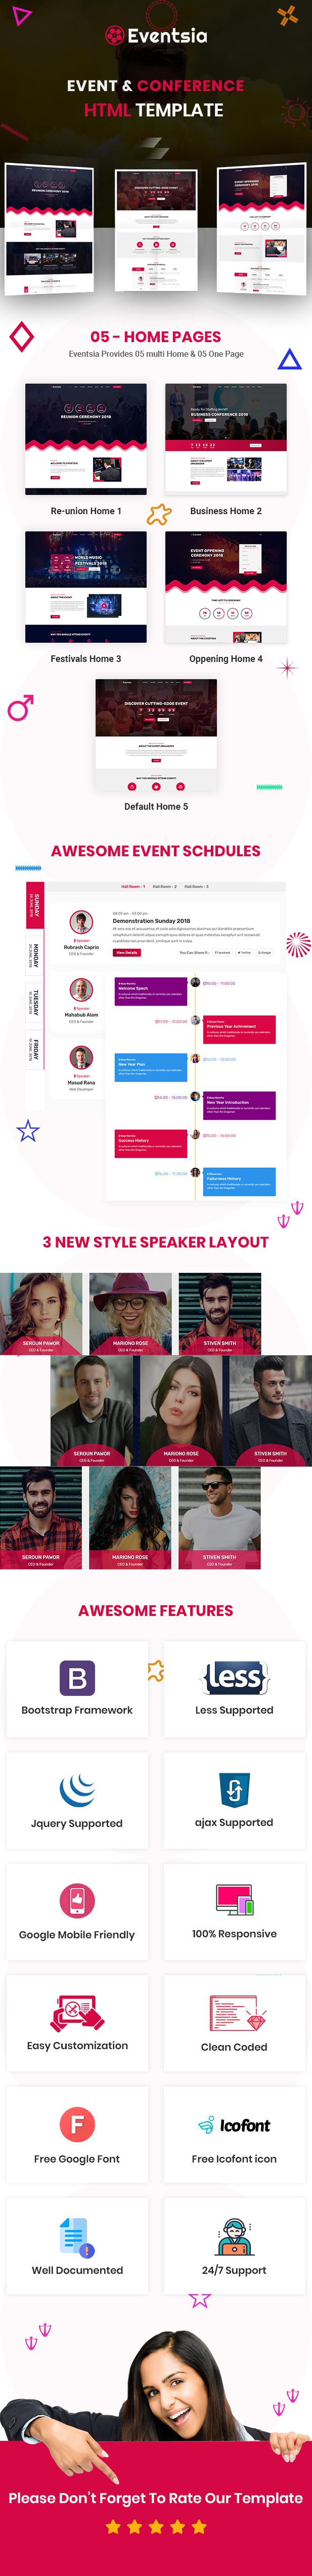 Eventsia - Event & Conference HTML Template